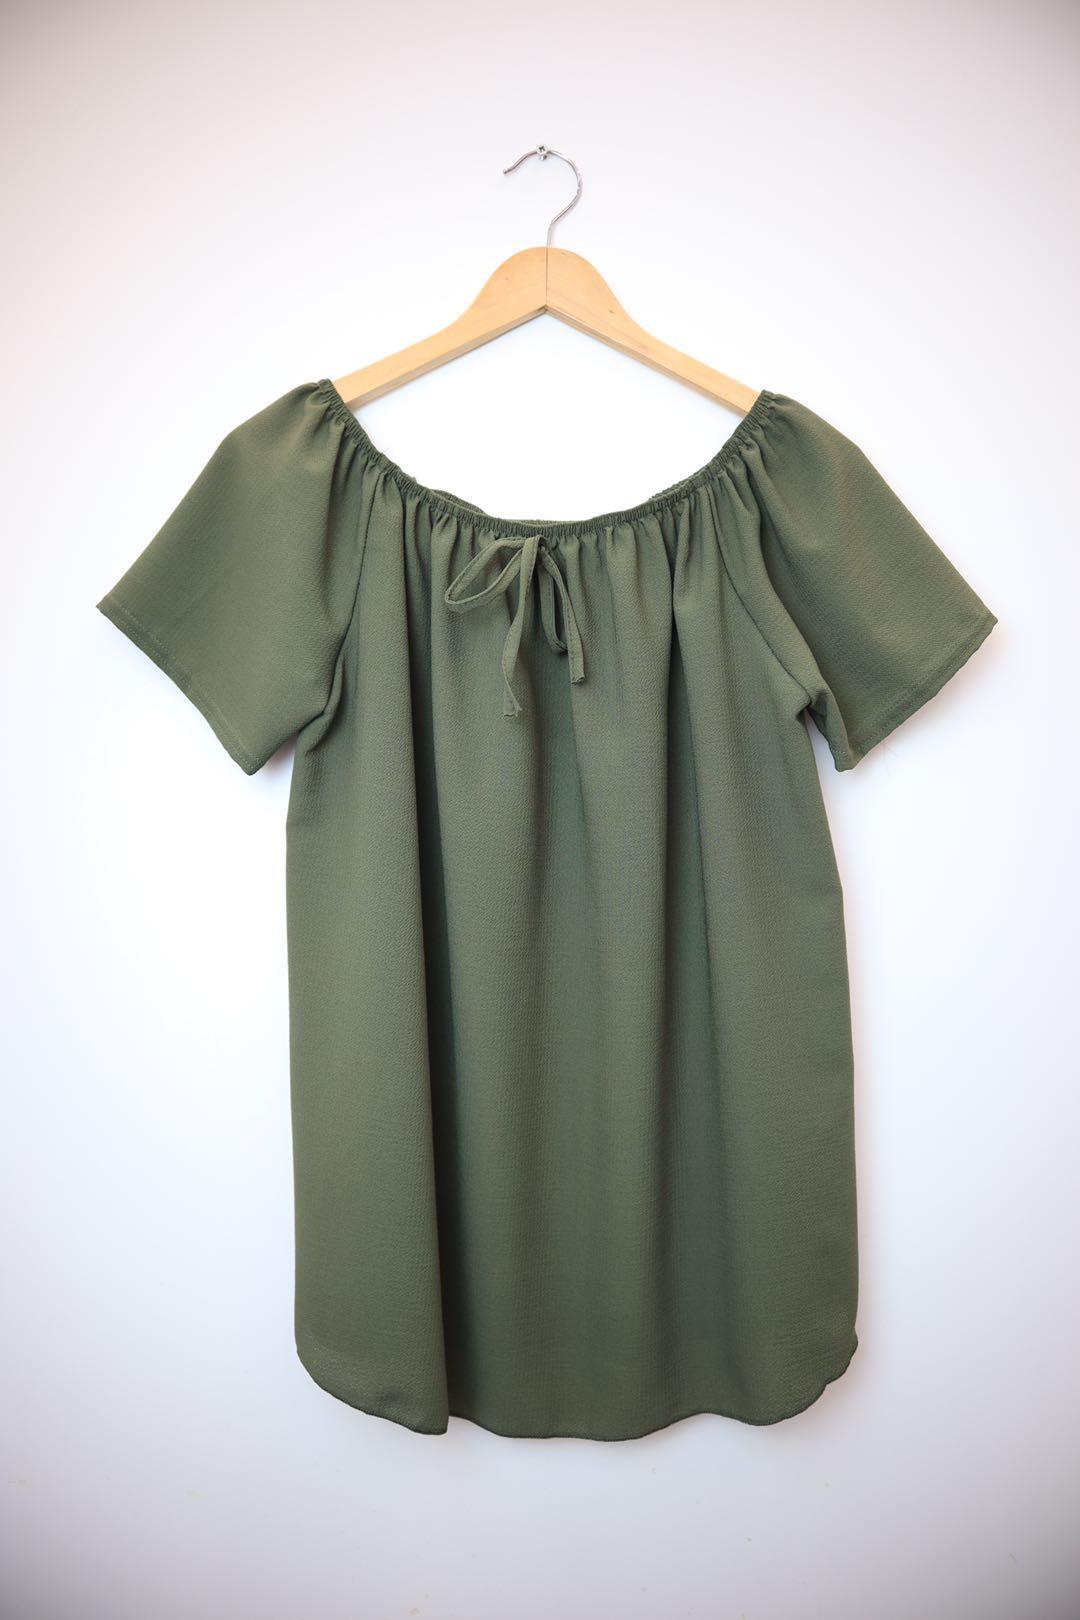 Robes mi-longues Femme Kaki SEE MODERN SEE-CICIA #c eFashion Paris